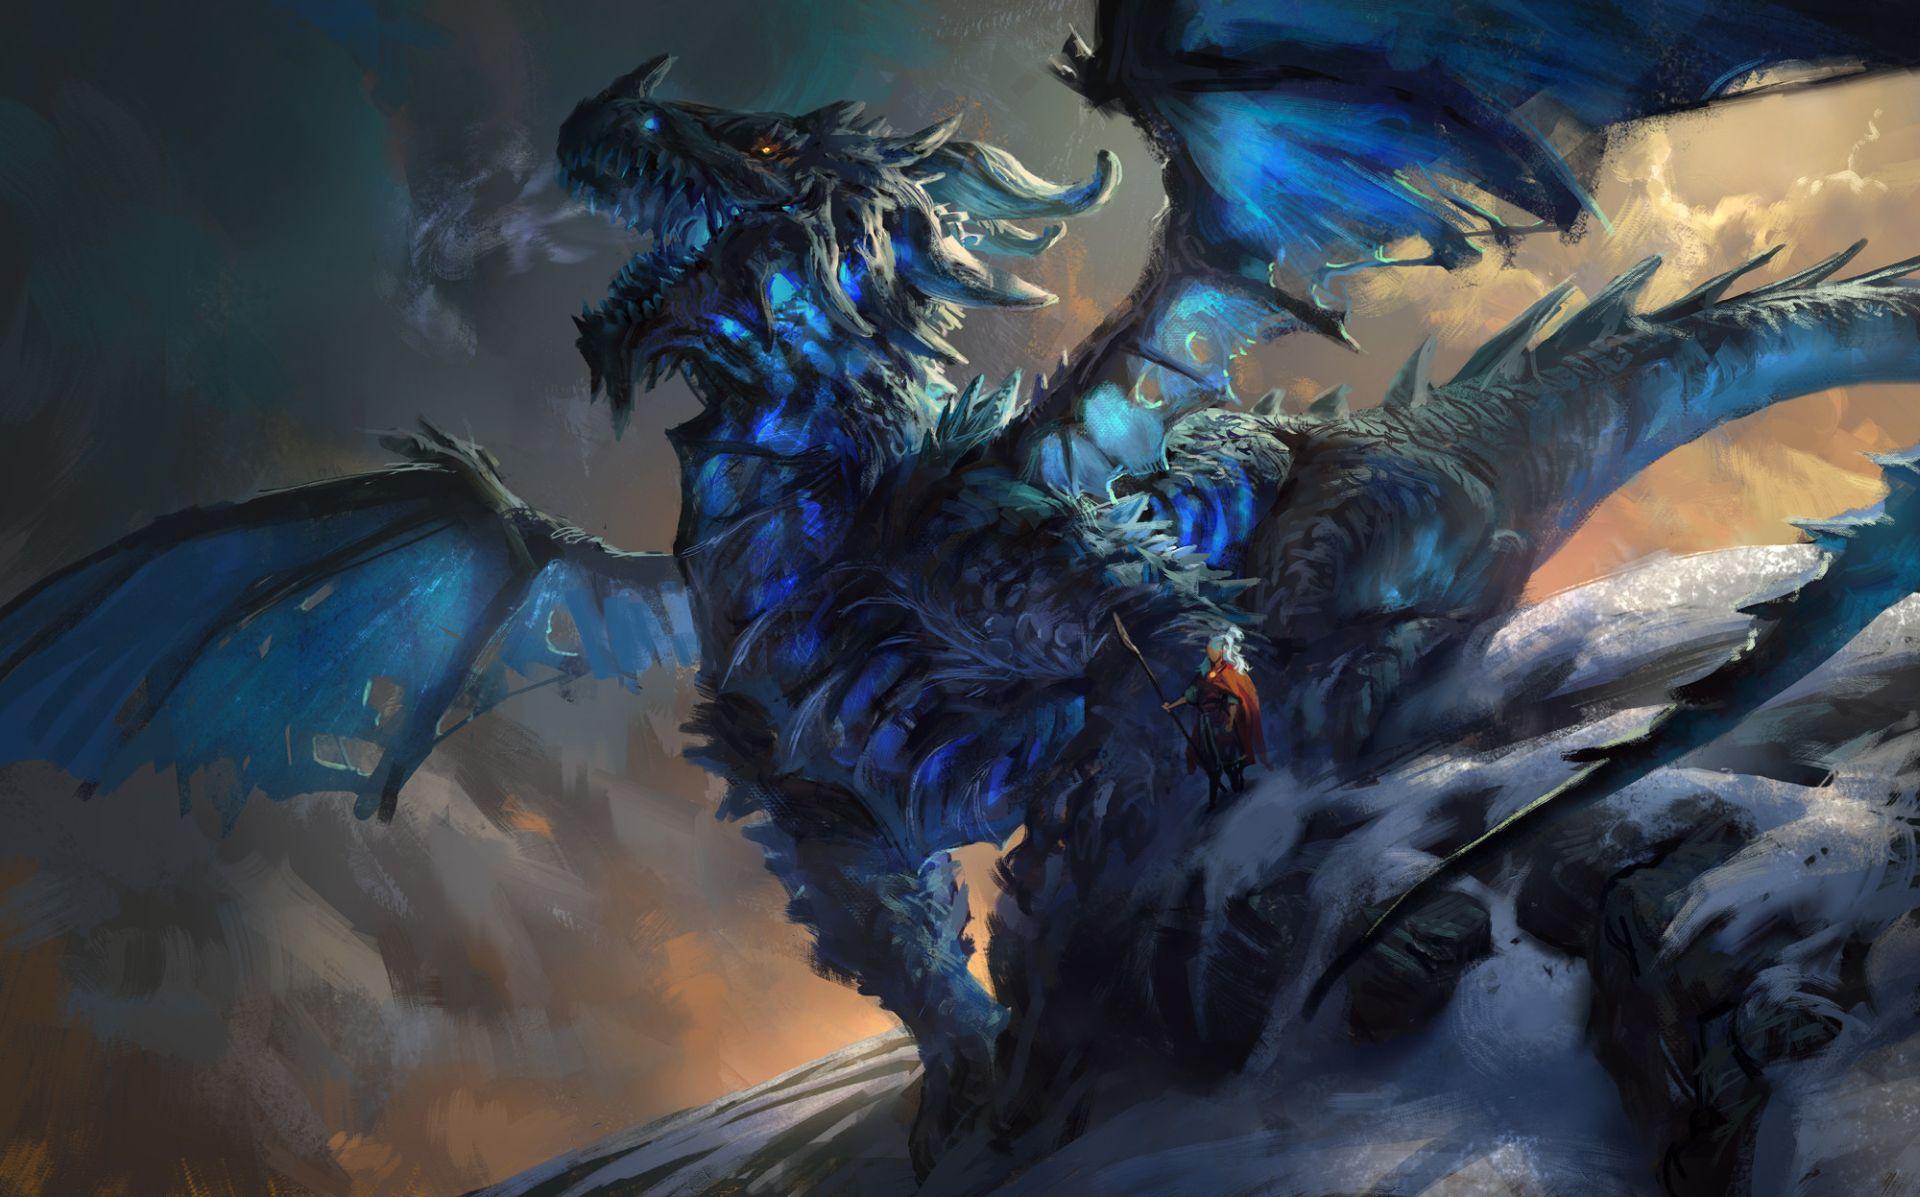 dragon background hd